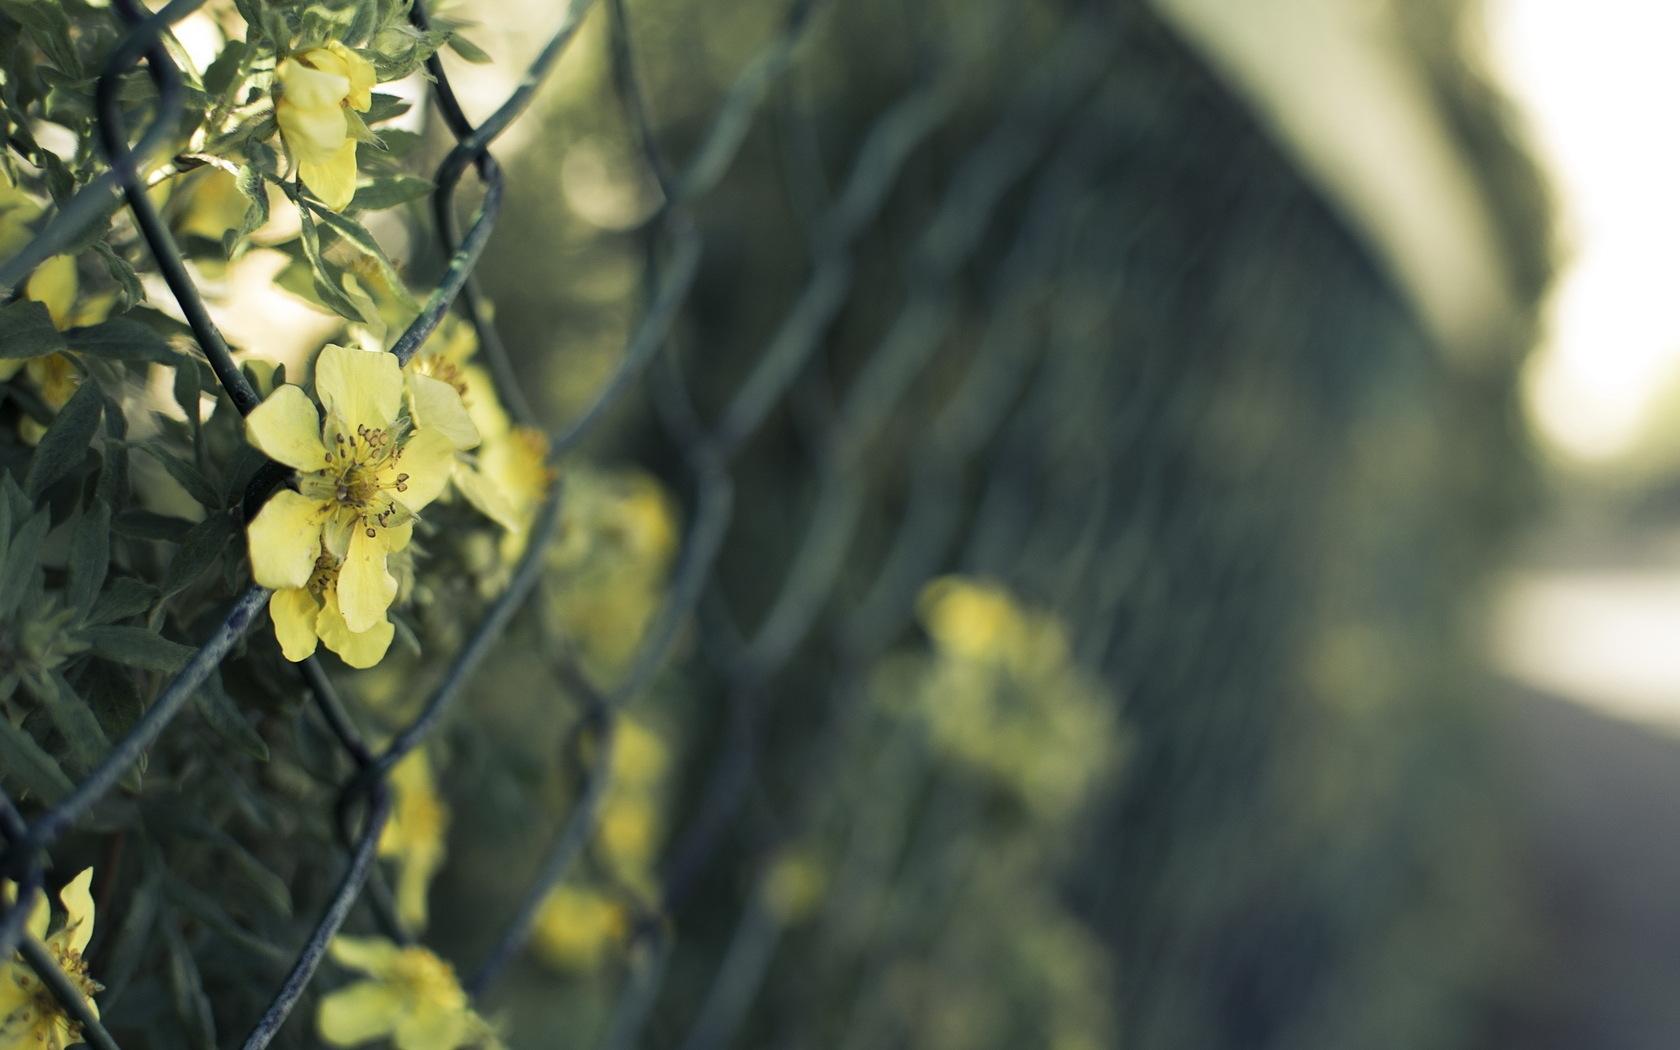 Hintergrundbilder Blumen Zaun Drahtgitter Licht 1680x1050